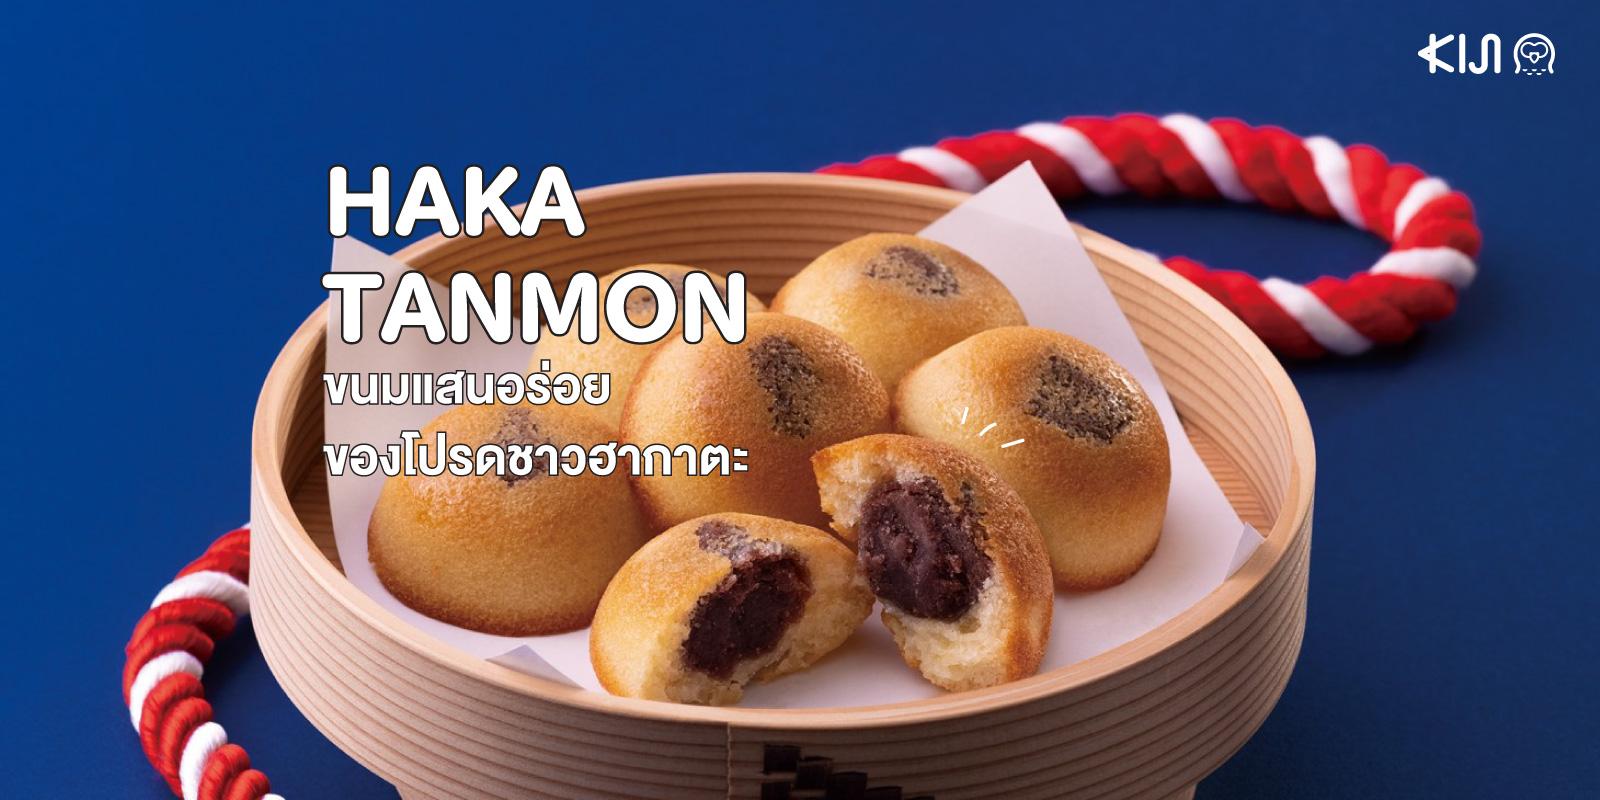 HAKATANMON : ขนมของฝากแบรนด์ใหม่ที่หาซื้อได้แค่ที่ฮากาตะ